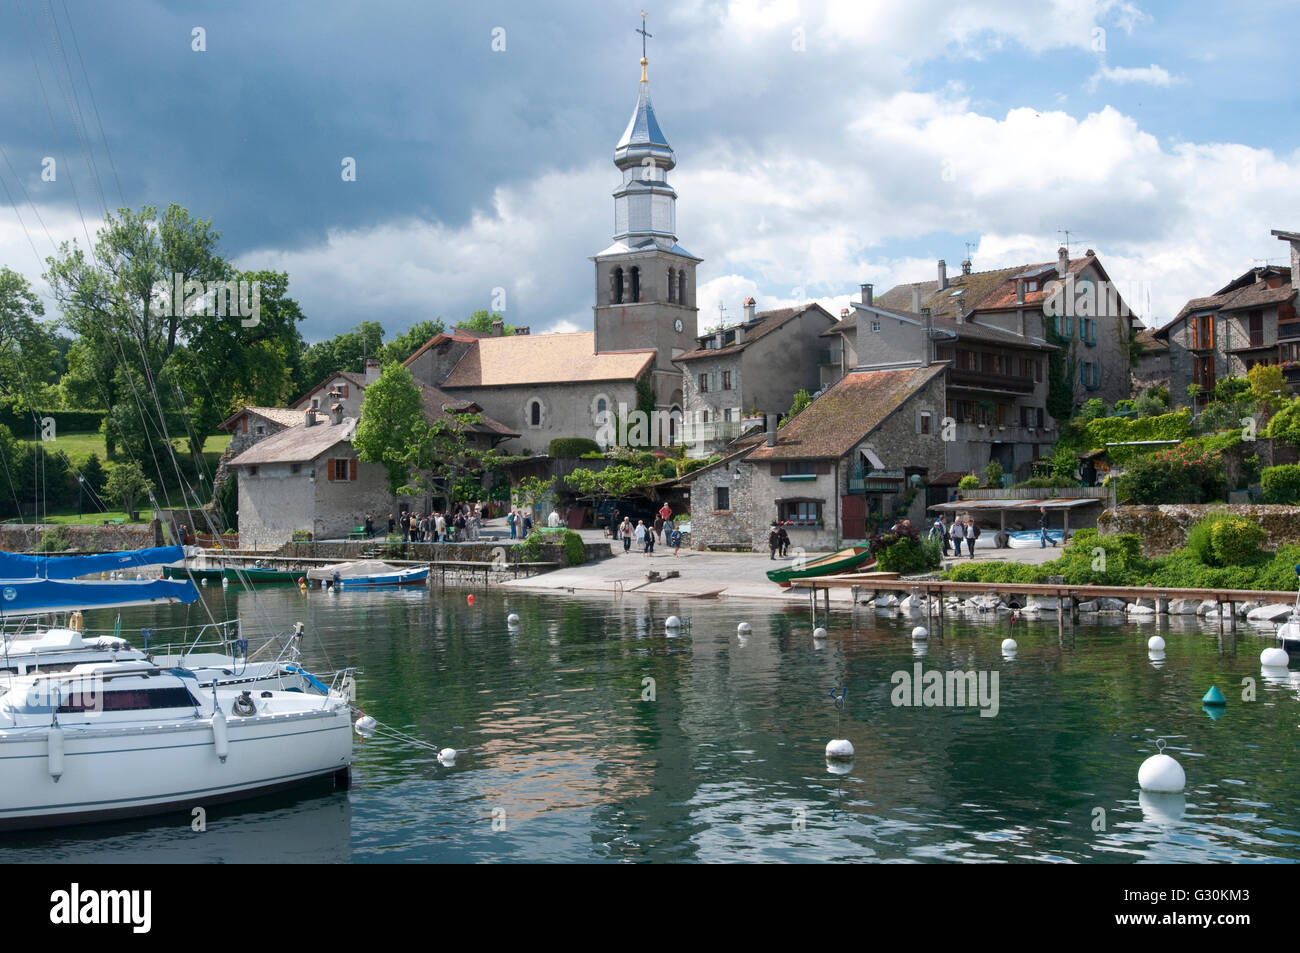 France, Rhone-Alpes, Haute-Savoie, Yvoire, village on Lake Geneva (Lac Leman) - Stock Image